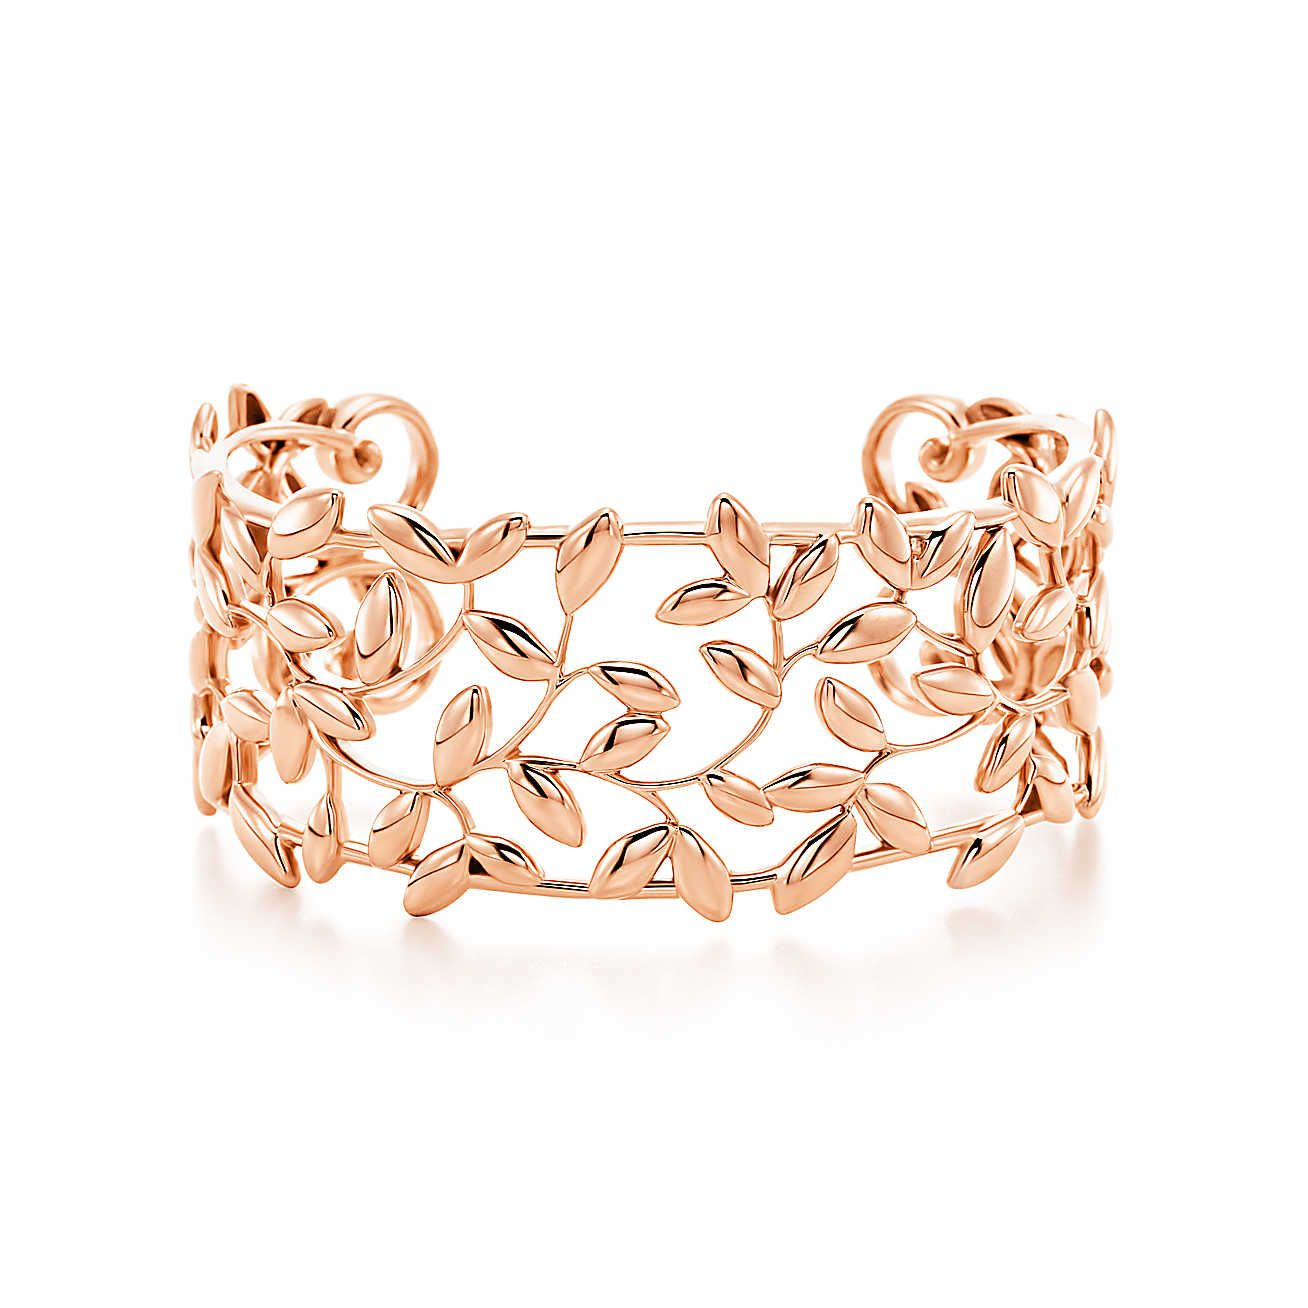 Tiffany & Co. Paloma Picasso®:Olive Leaf Cuff